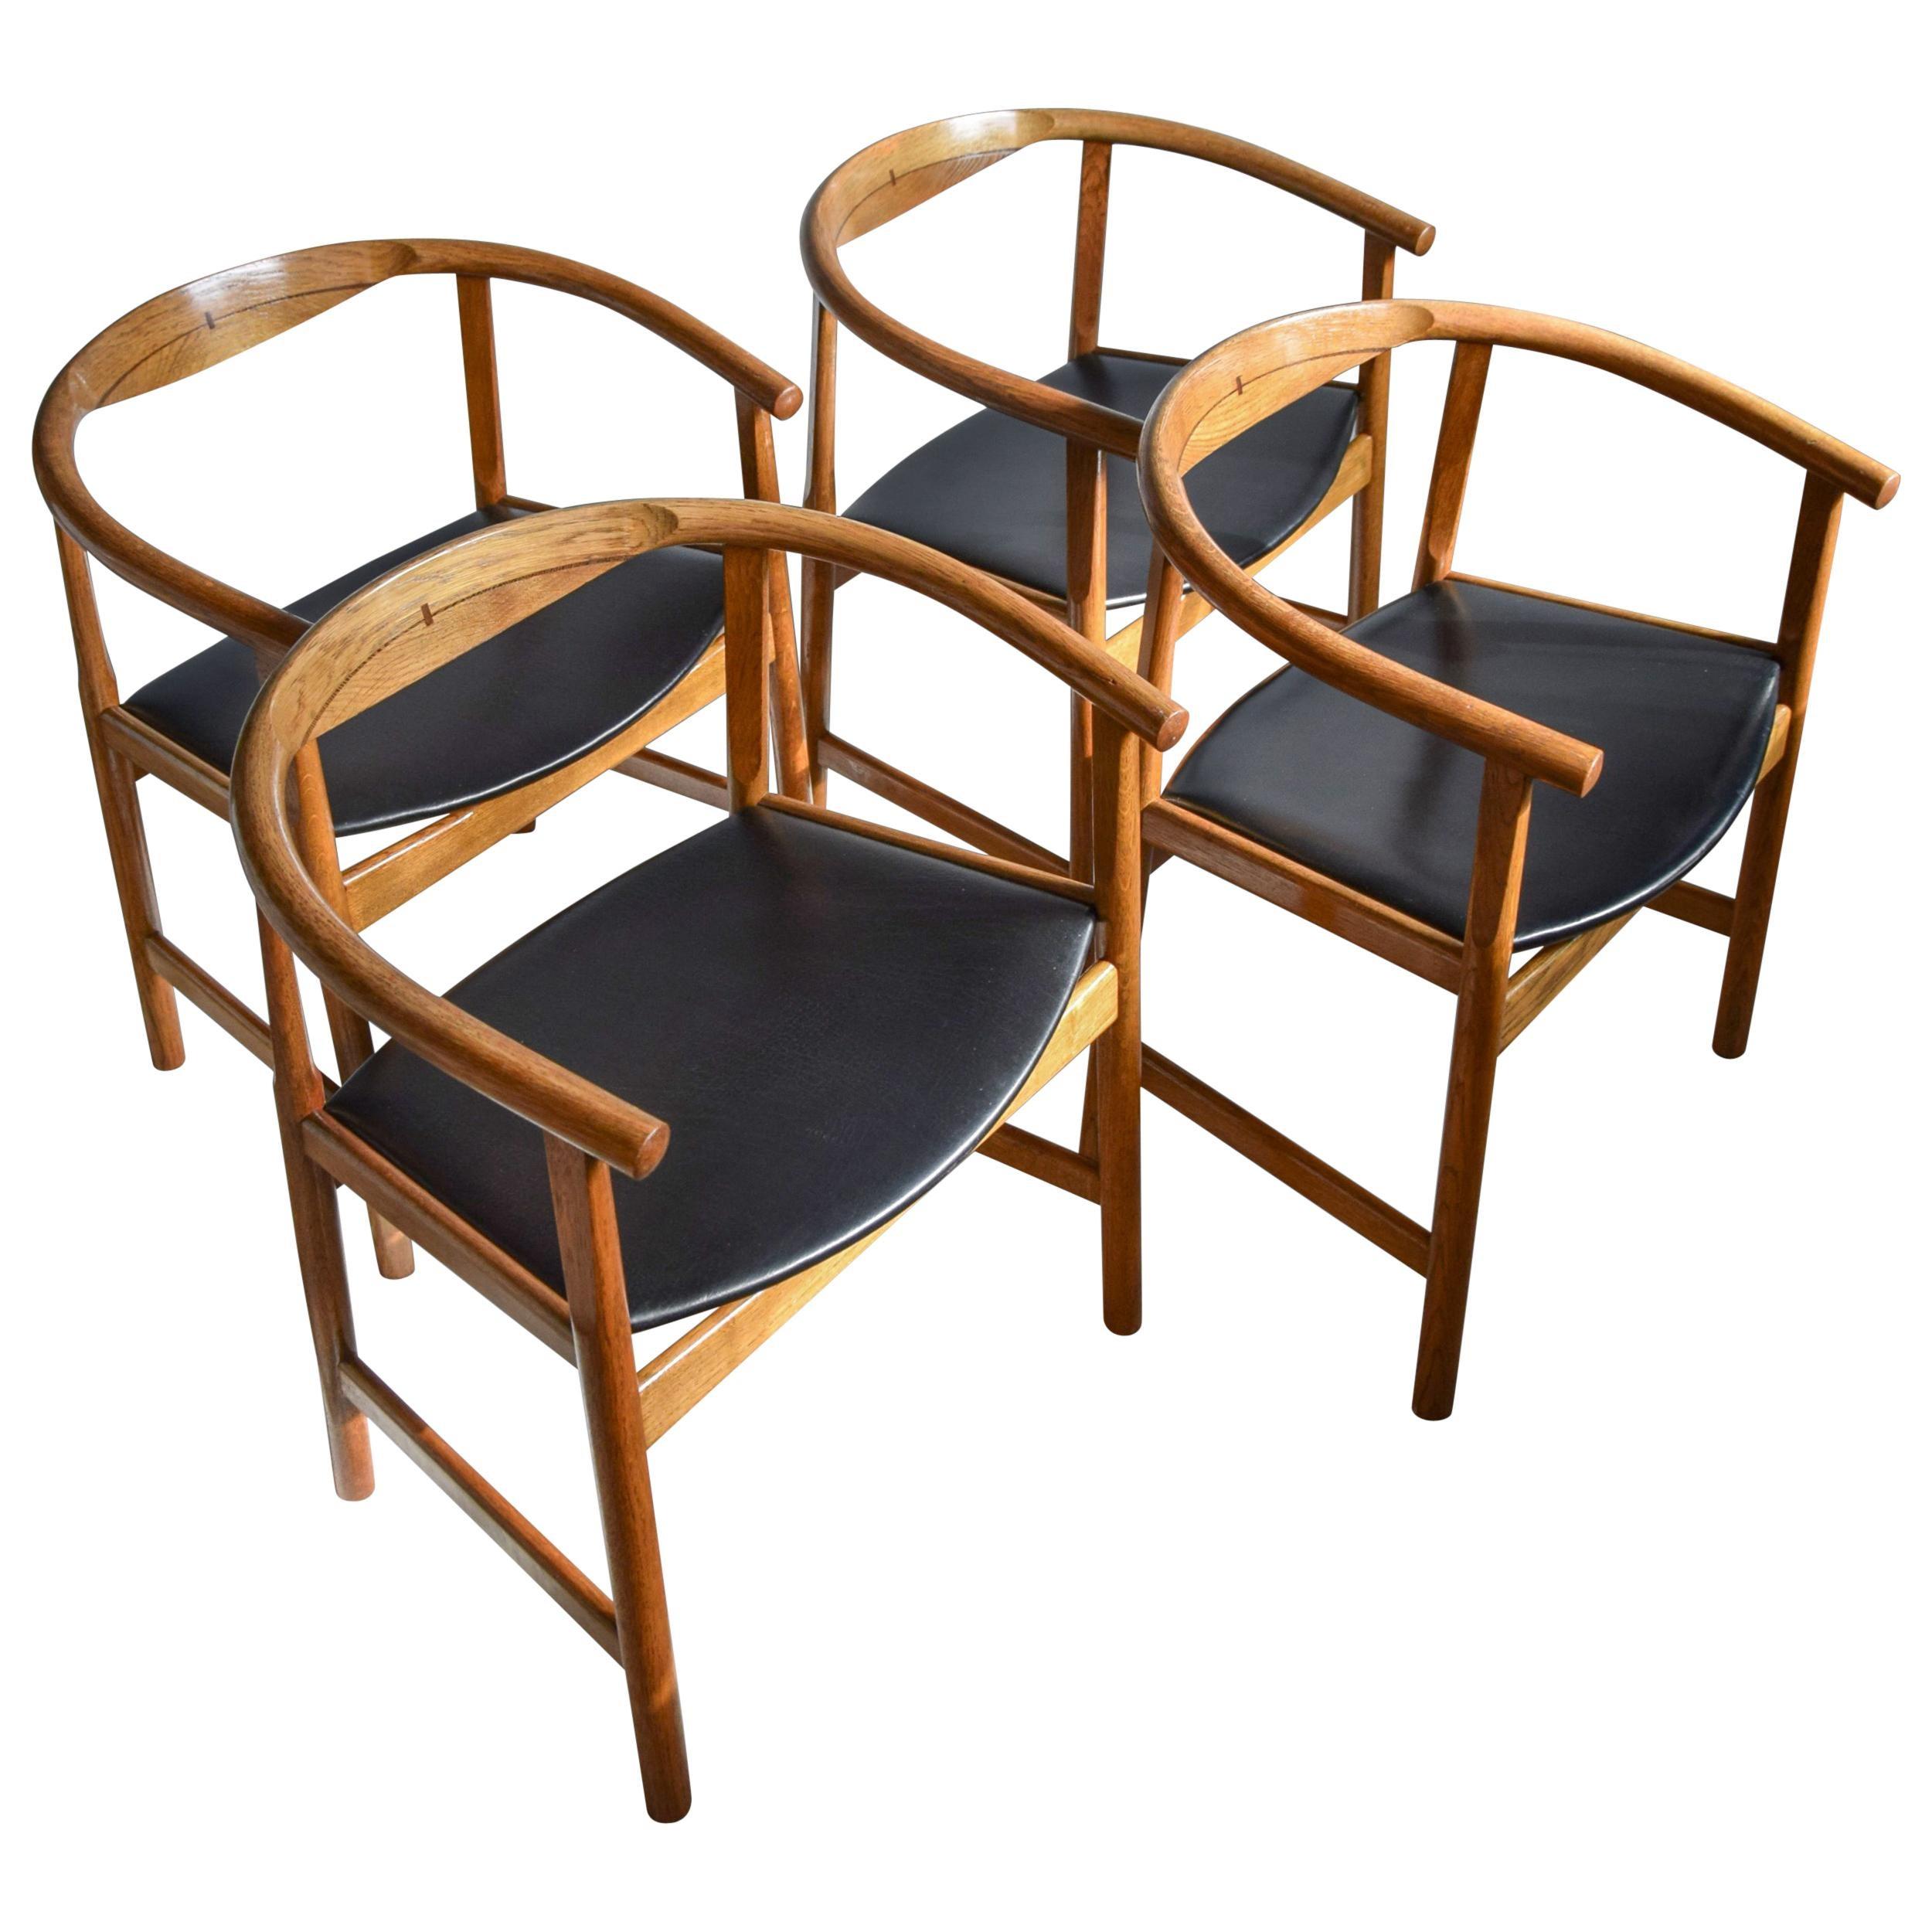 Four Mid-Century Modern Hans Wegner PP 203 Oak and Wenge Chairs